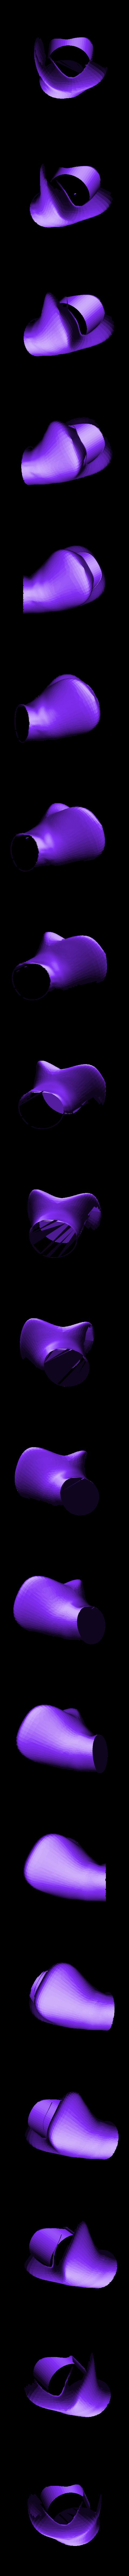 forearm_right_1.stl Download free STL file Princess Peach from Mario games - multi-color • 3D print design, bpitanga